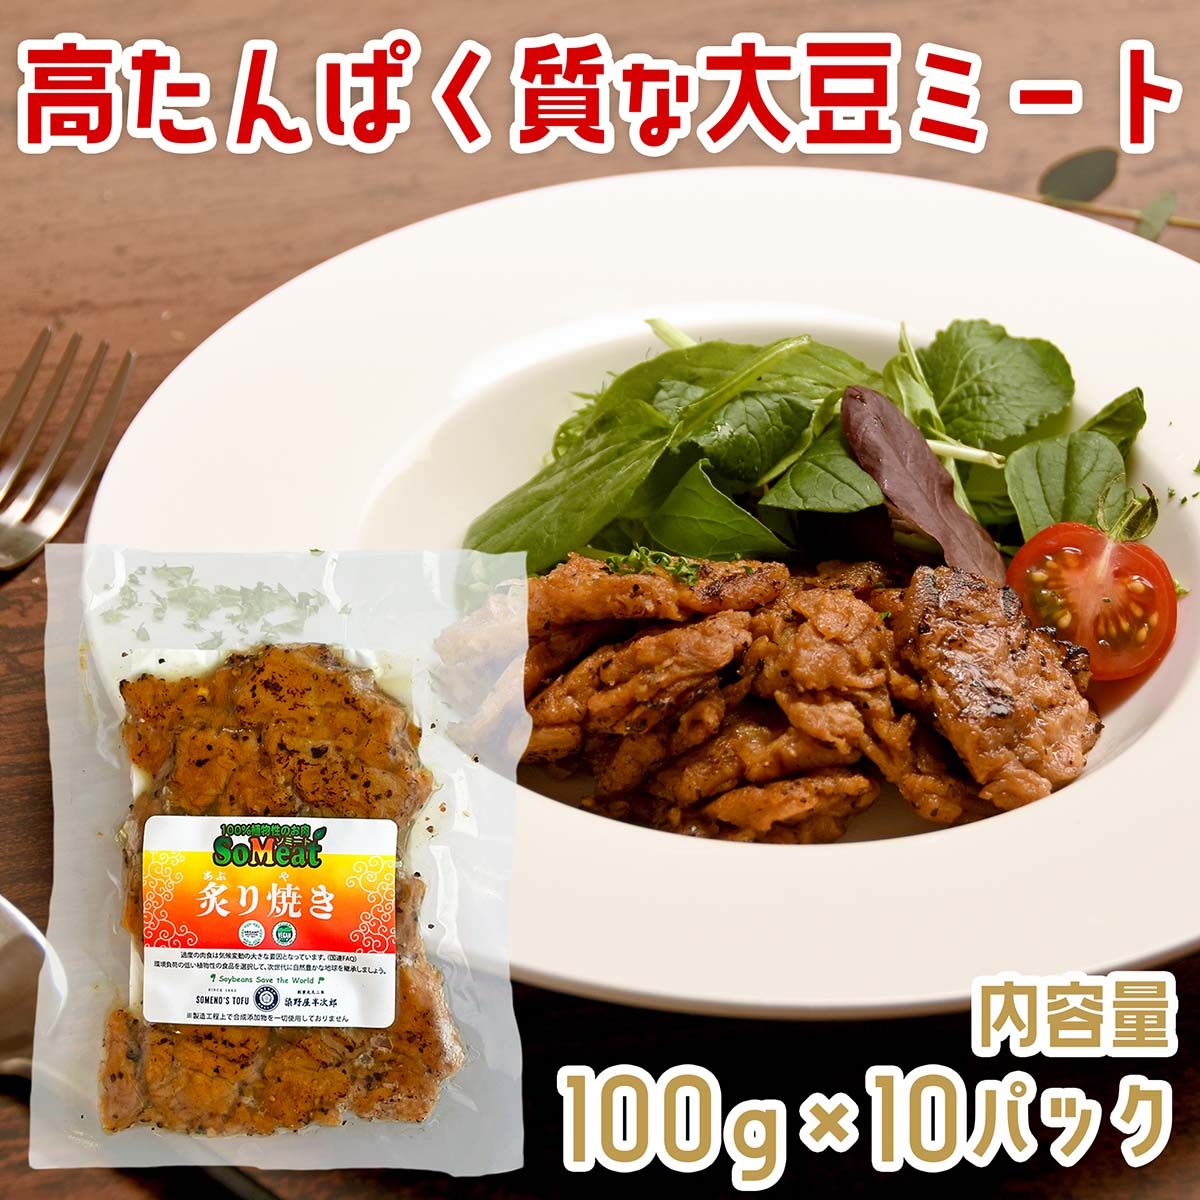 Aburiyaki (Grilled)